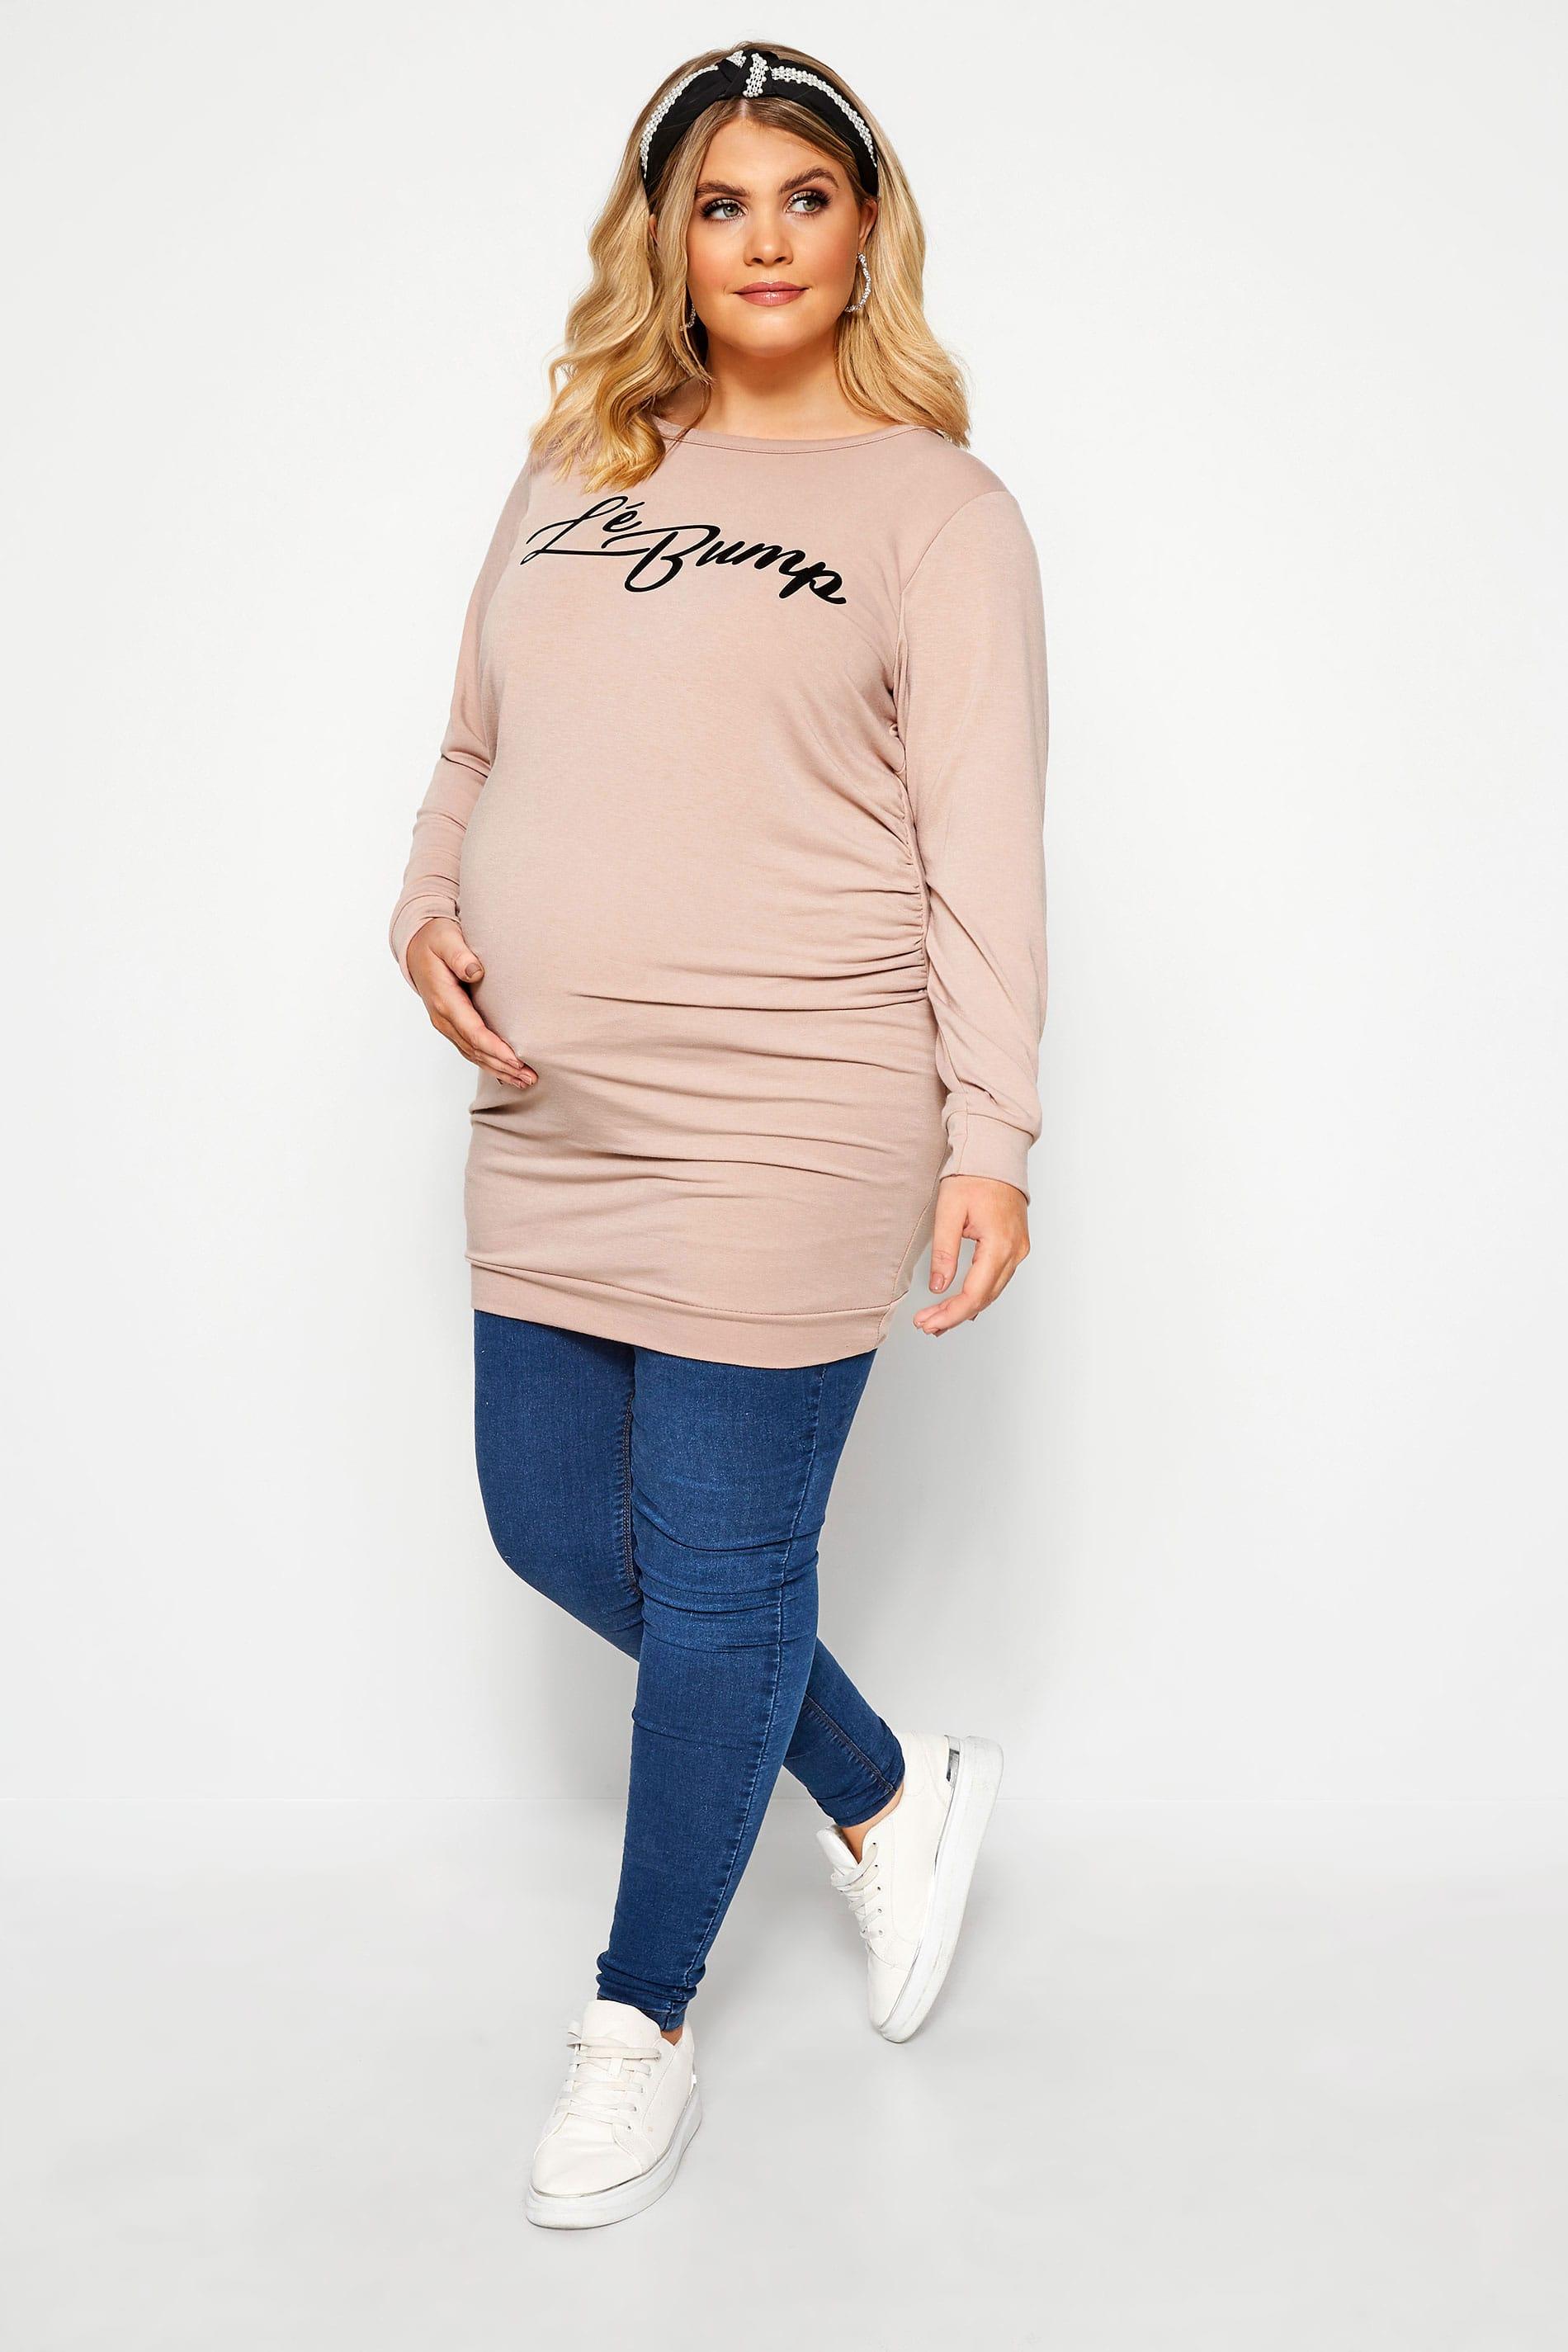 BUMP IT UP MATERNITY Nude 'Lé Bump' Slogan Sweatshirt